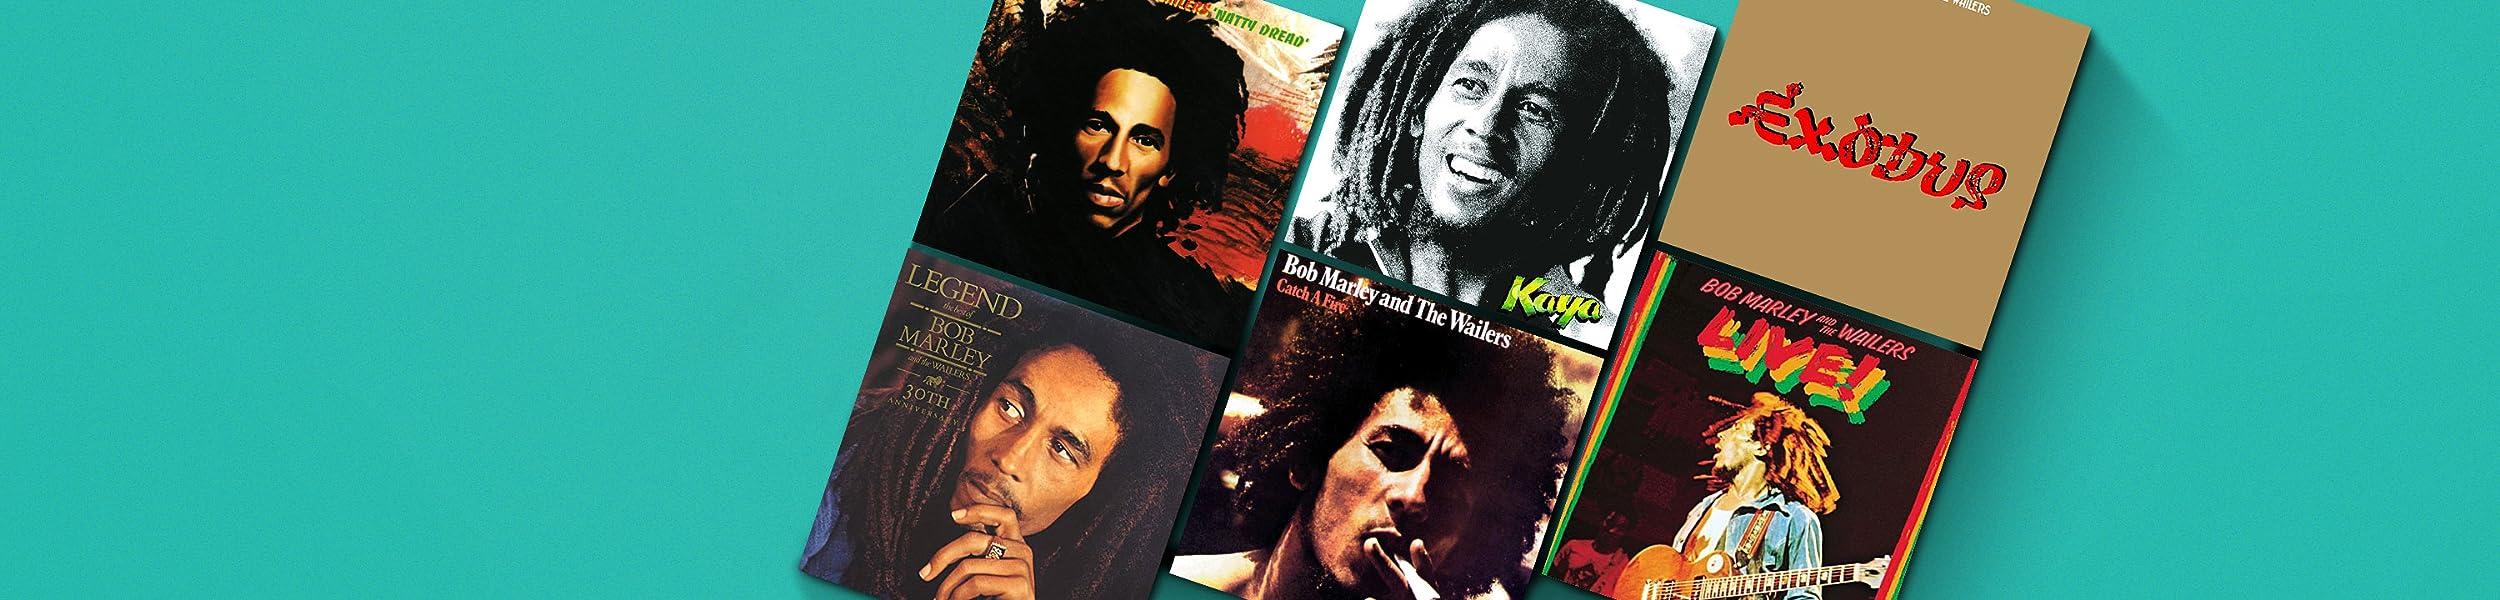 Bob Marley on vinyl